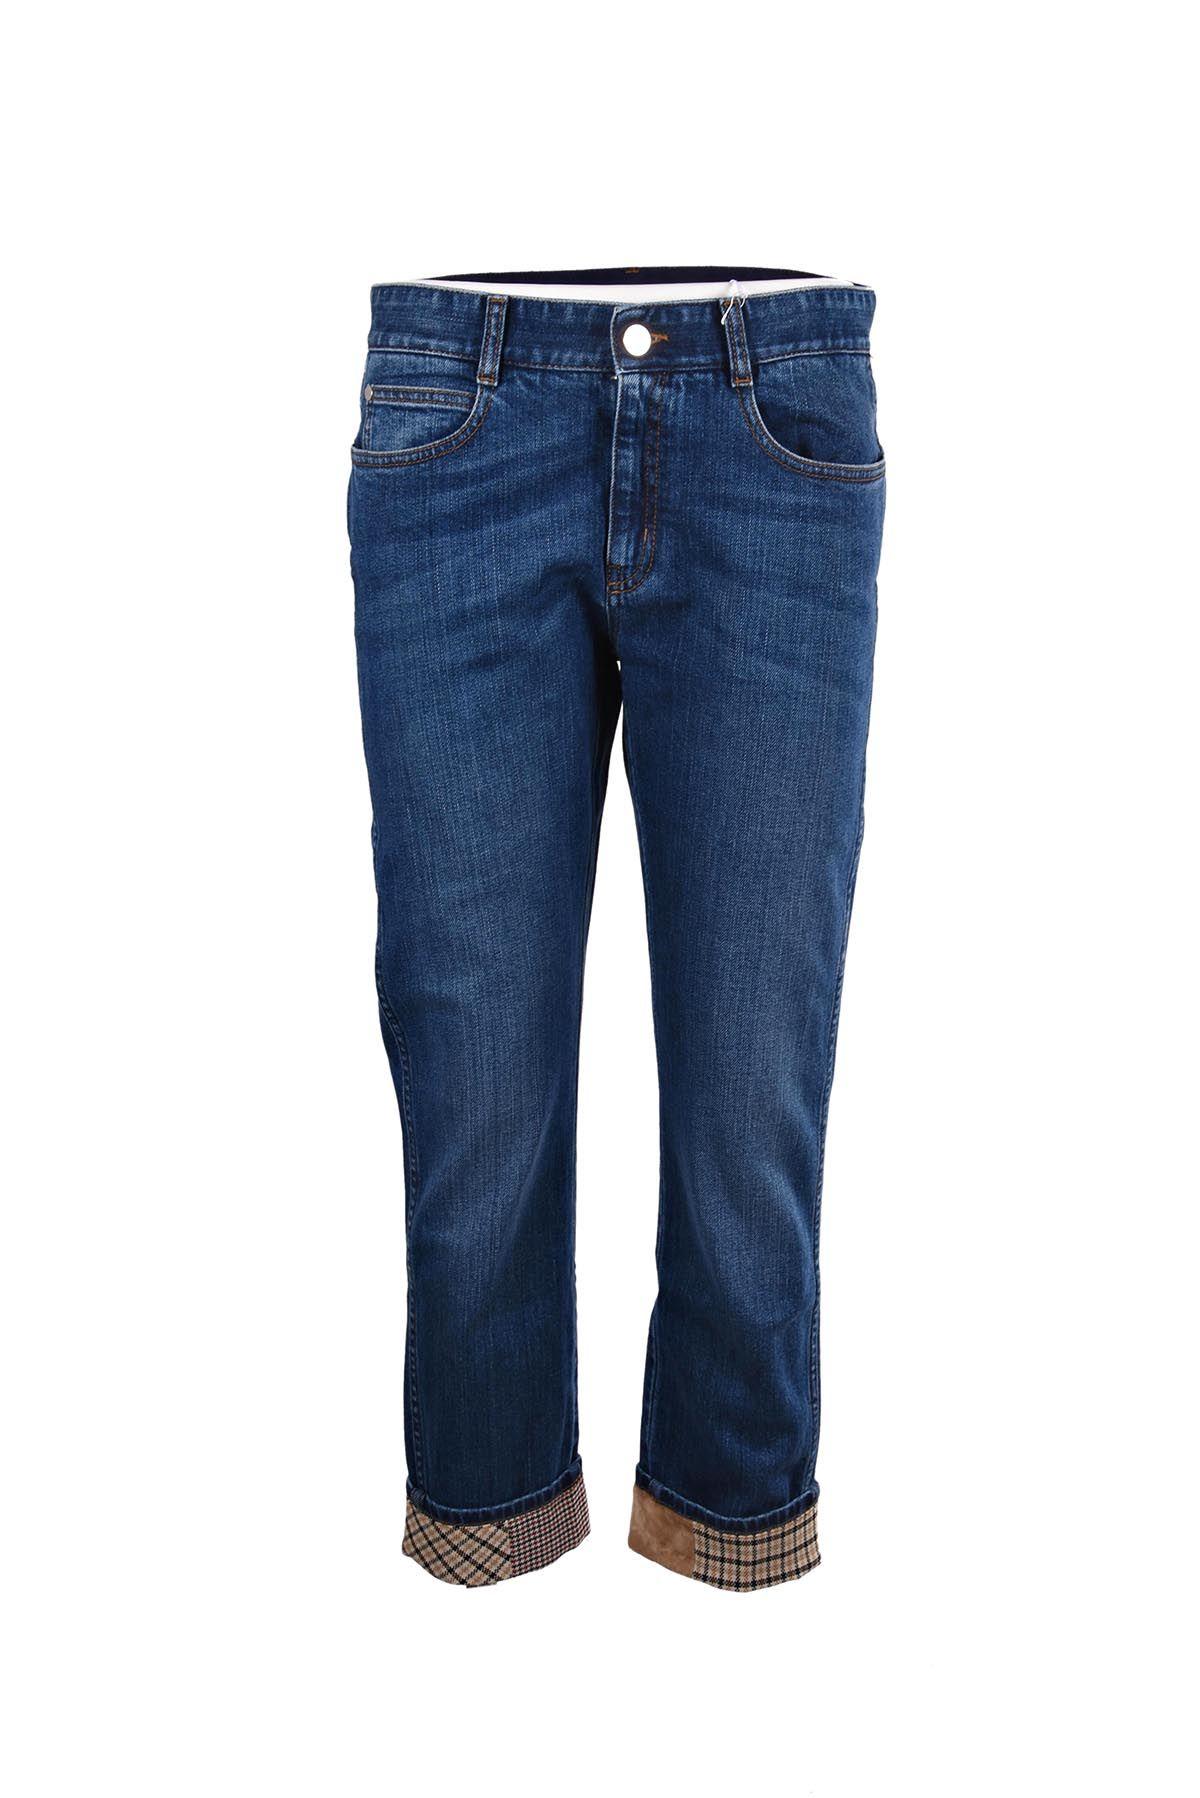 Stella McCartney Mccartney Check Pocket Denim Jeans